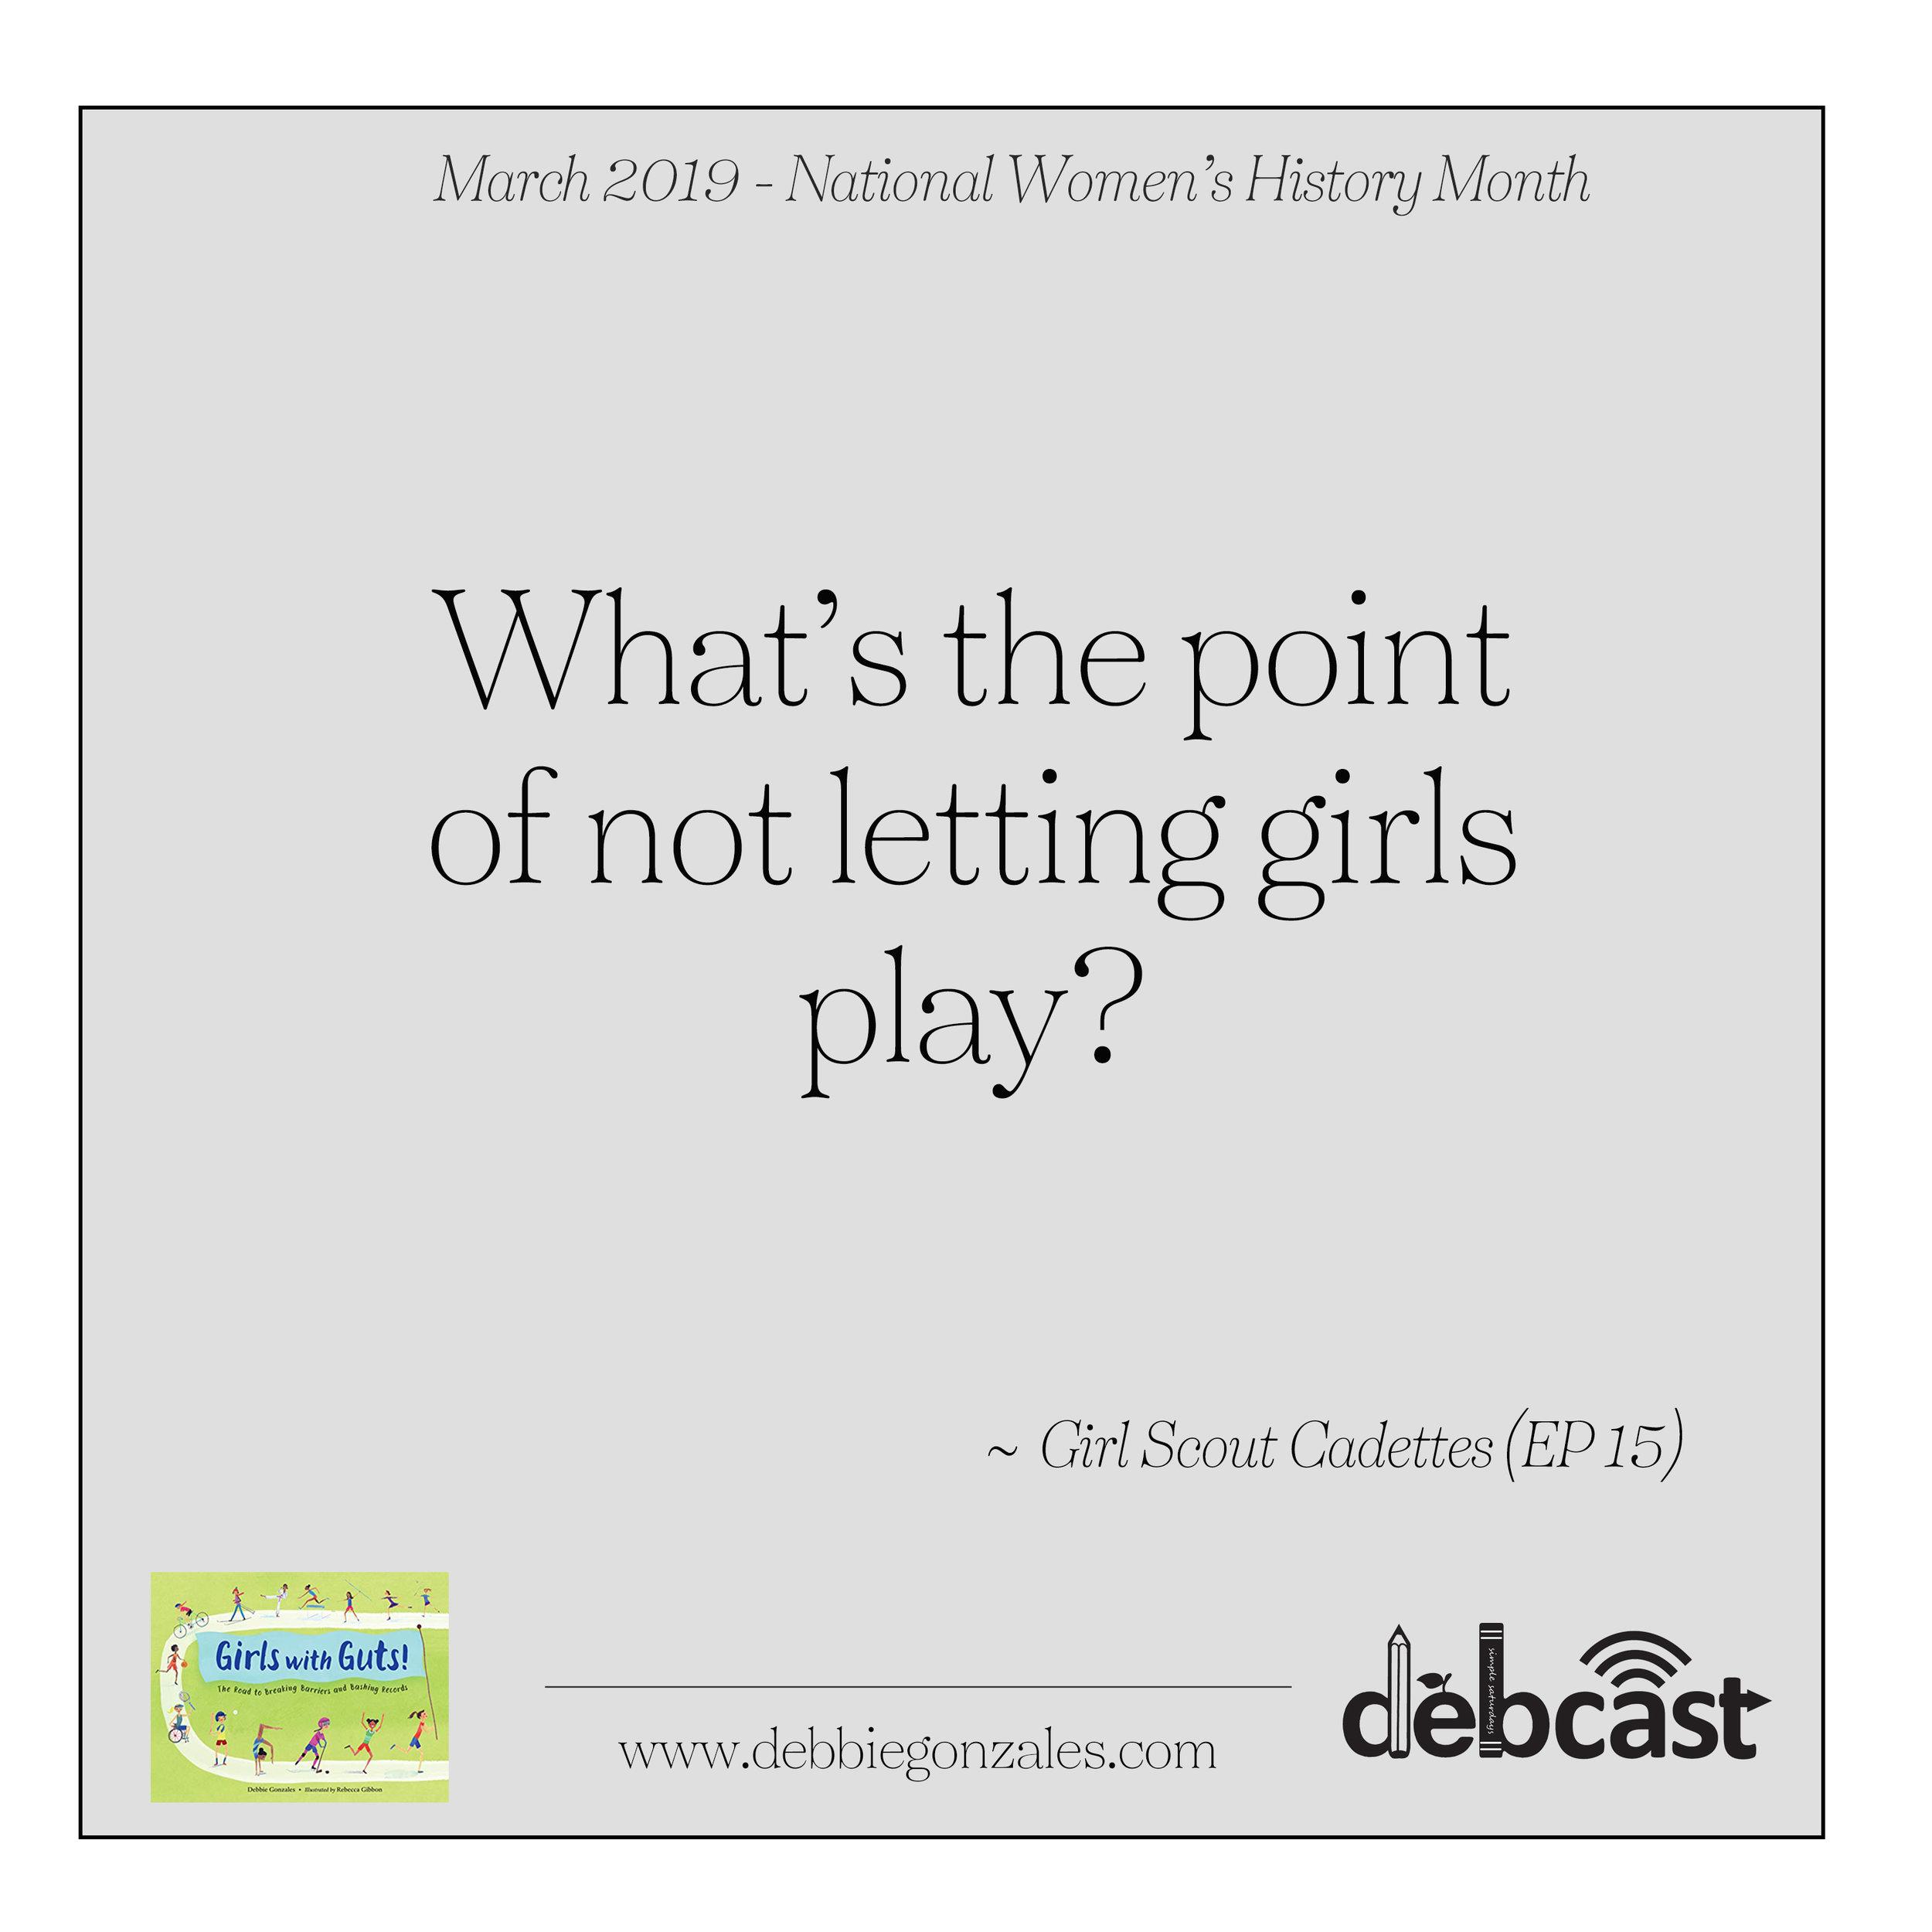 Mar 17 - Debcast - Girls Scouts.jpg